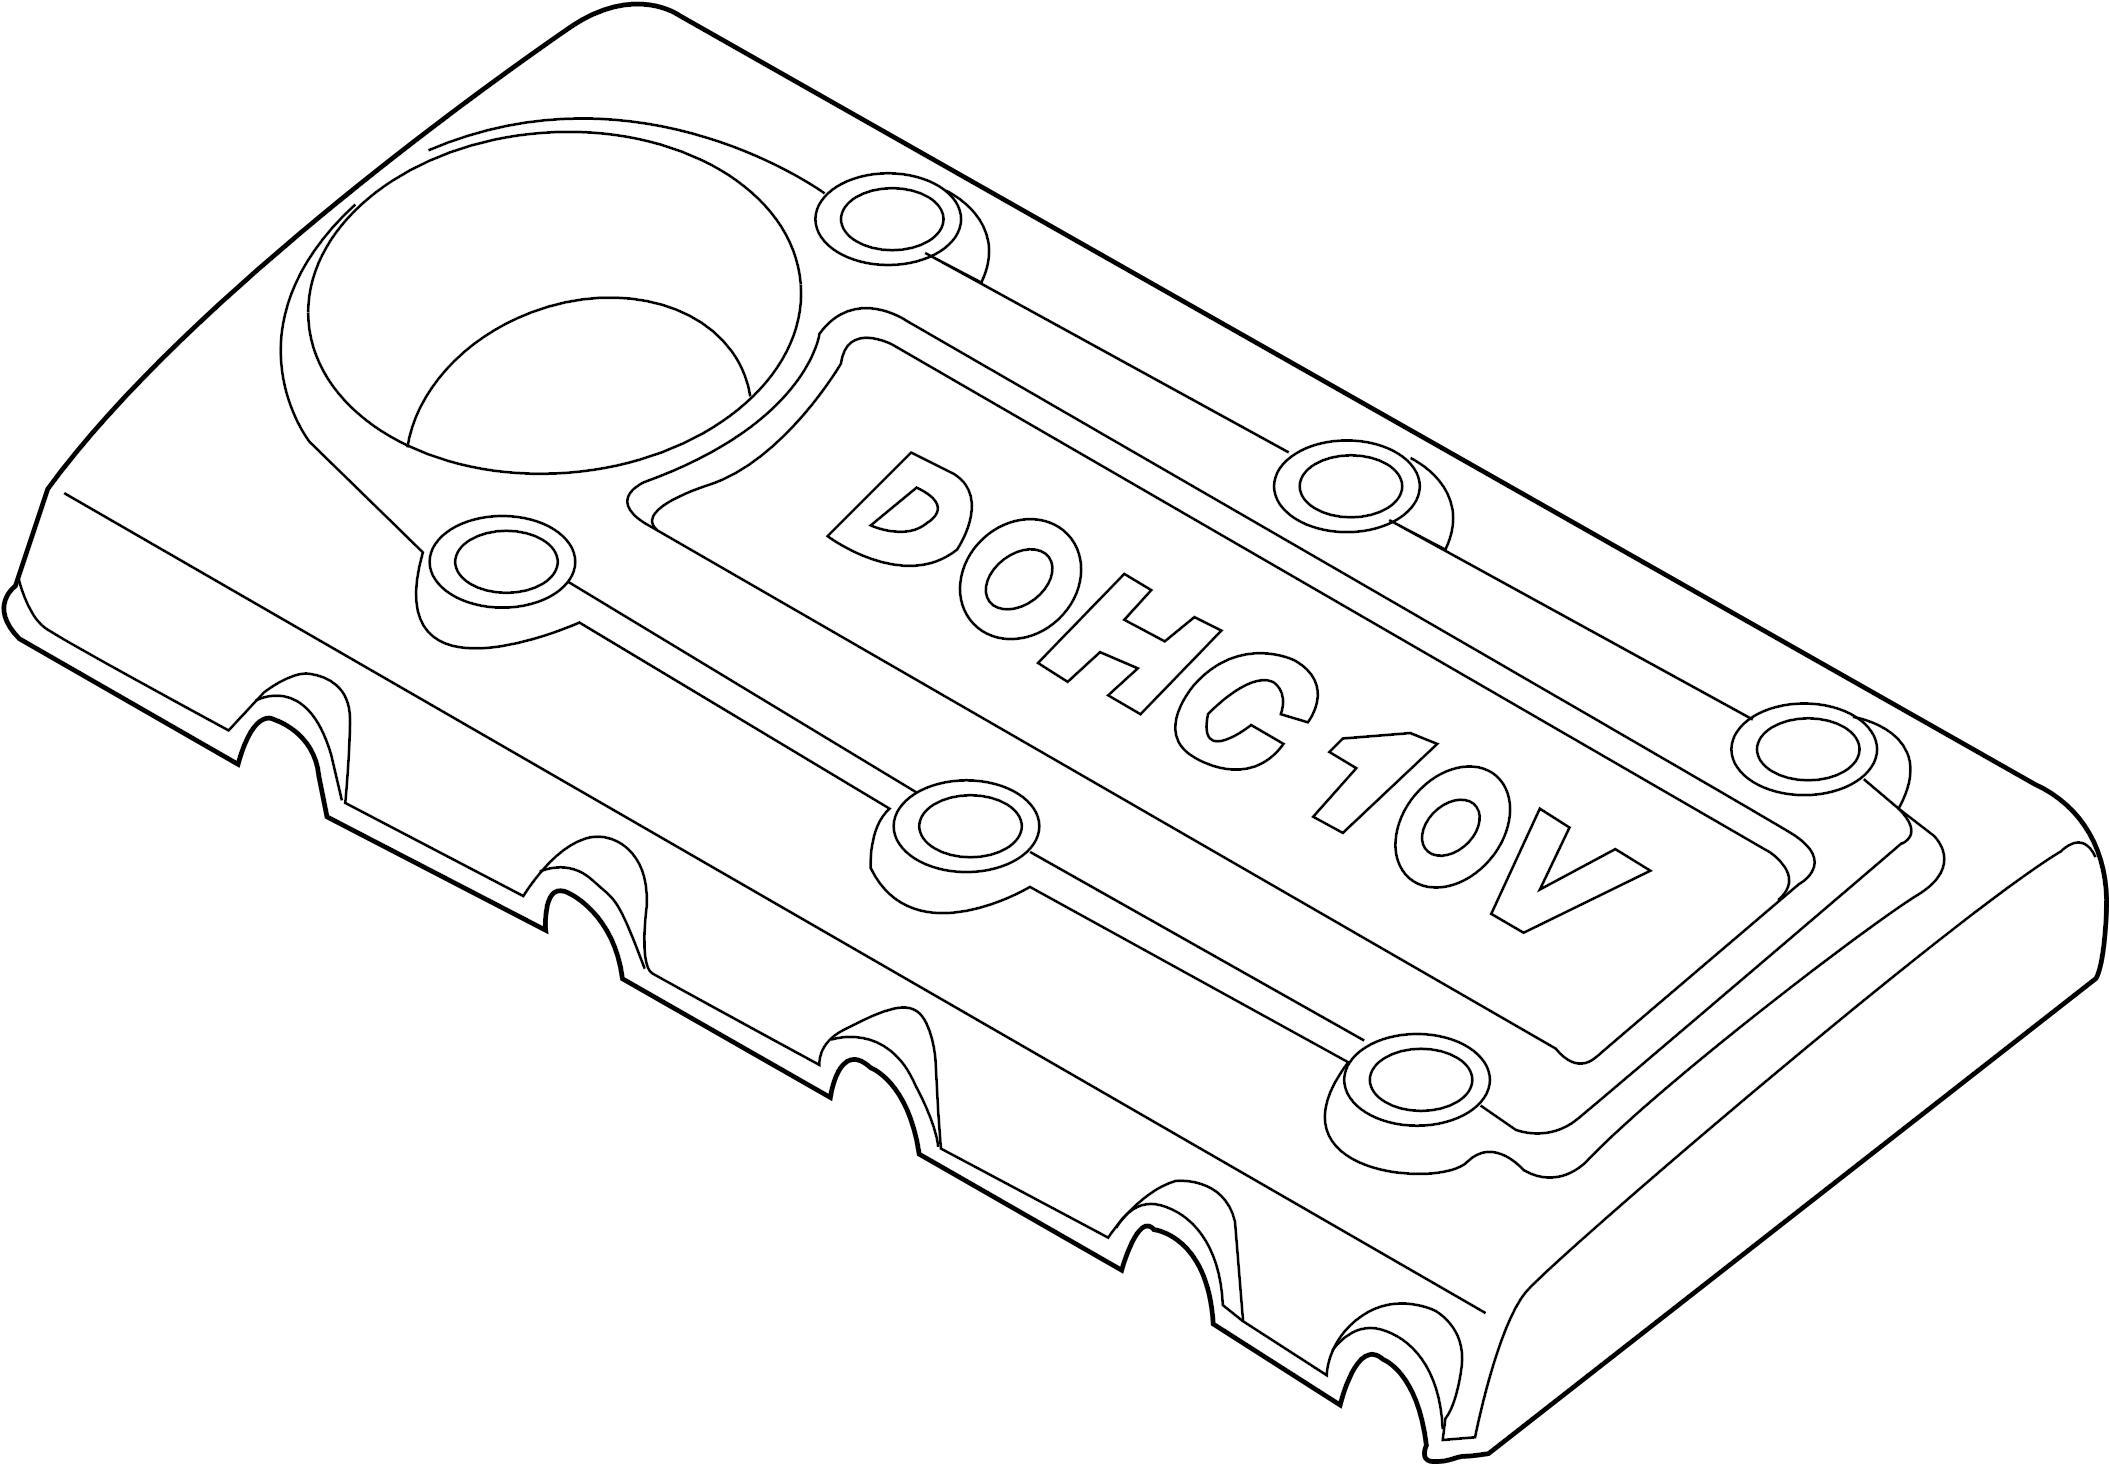 Saturn Se Fuse Box Location. Saturn. Auto Fuse Box Diagram